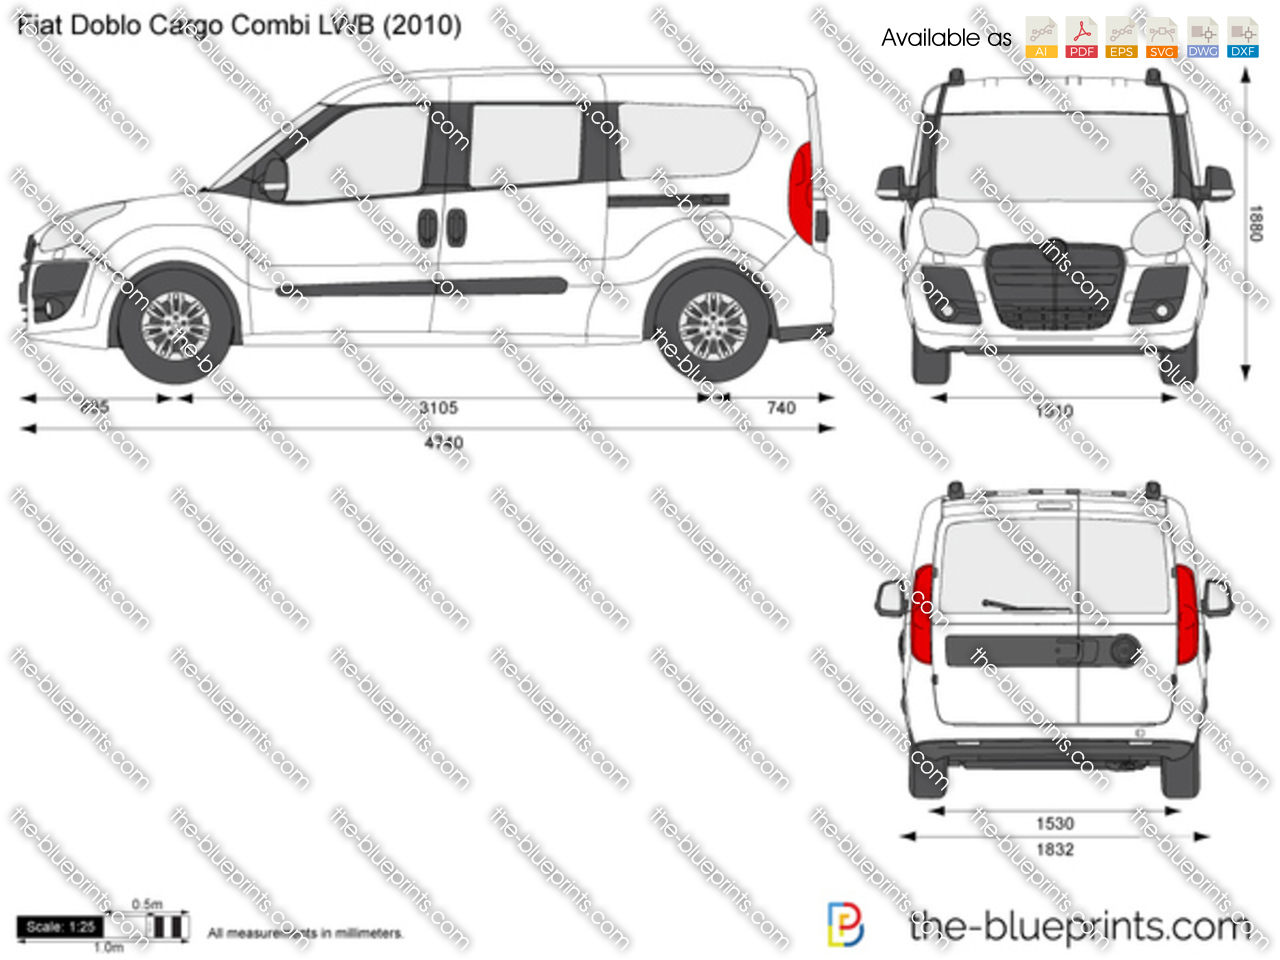 Fiat Doblo Cargo Combi LWB 2009